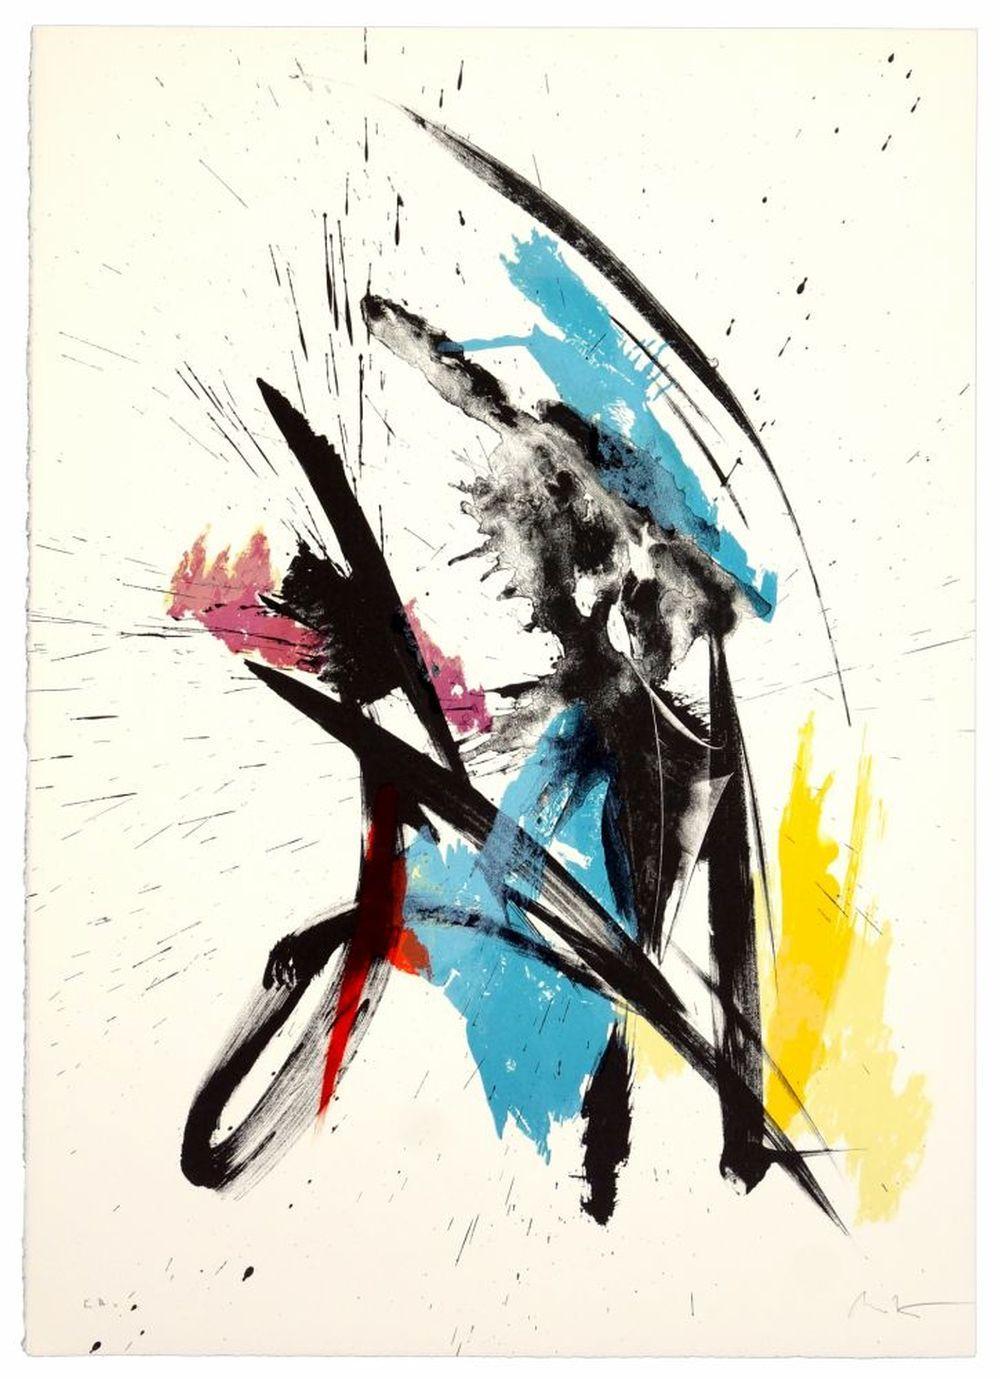 Jean Miotte - Composition I, 1990